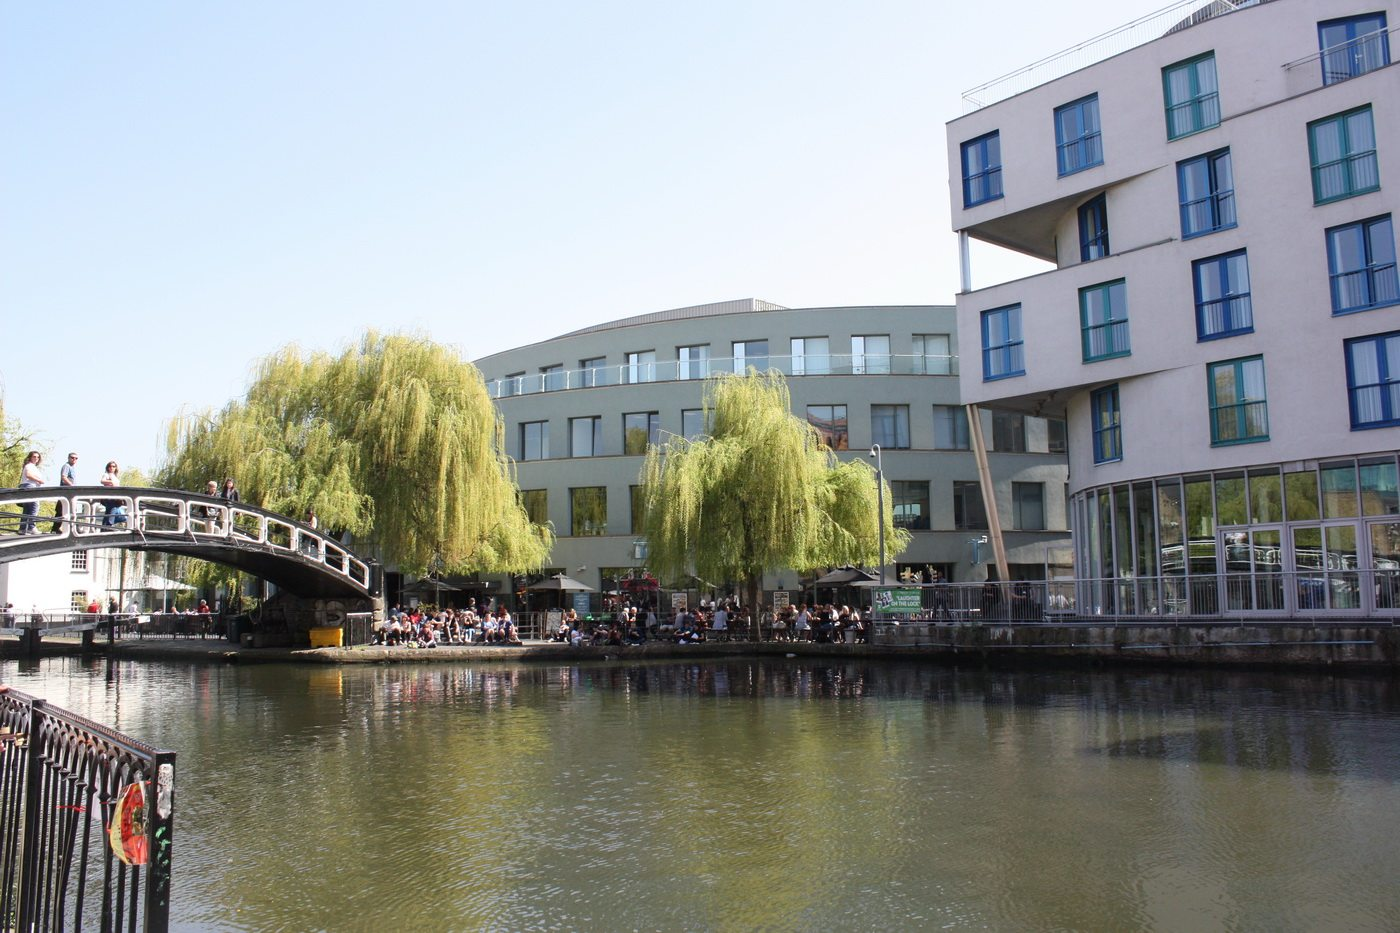 camden market river